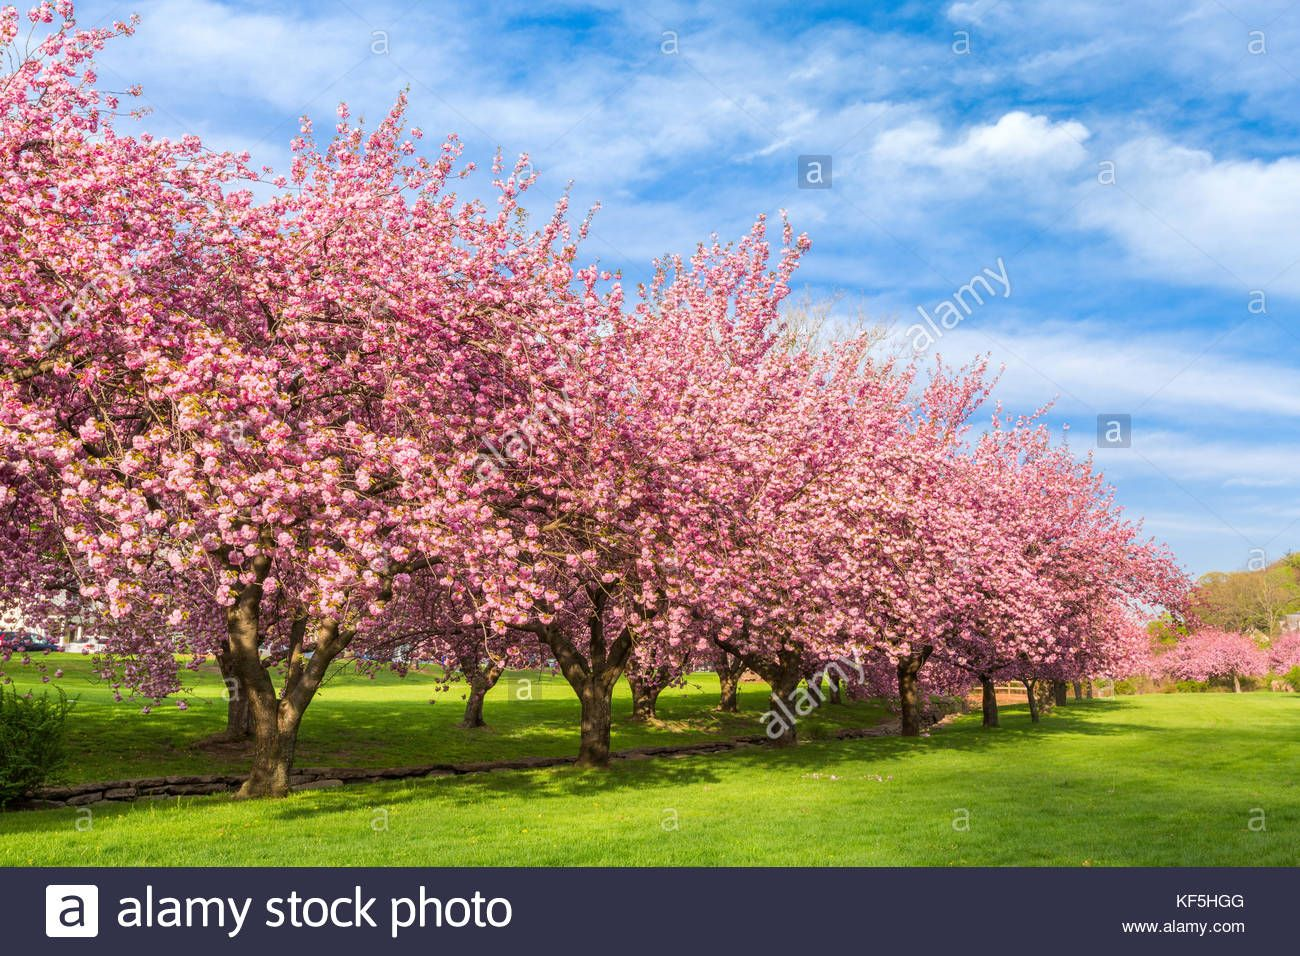 Found On Bing From Www Alamy Com Flowering Cherry Tree Blossom Trees Cherry Blossom Tree